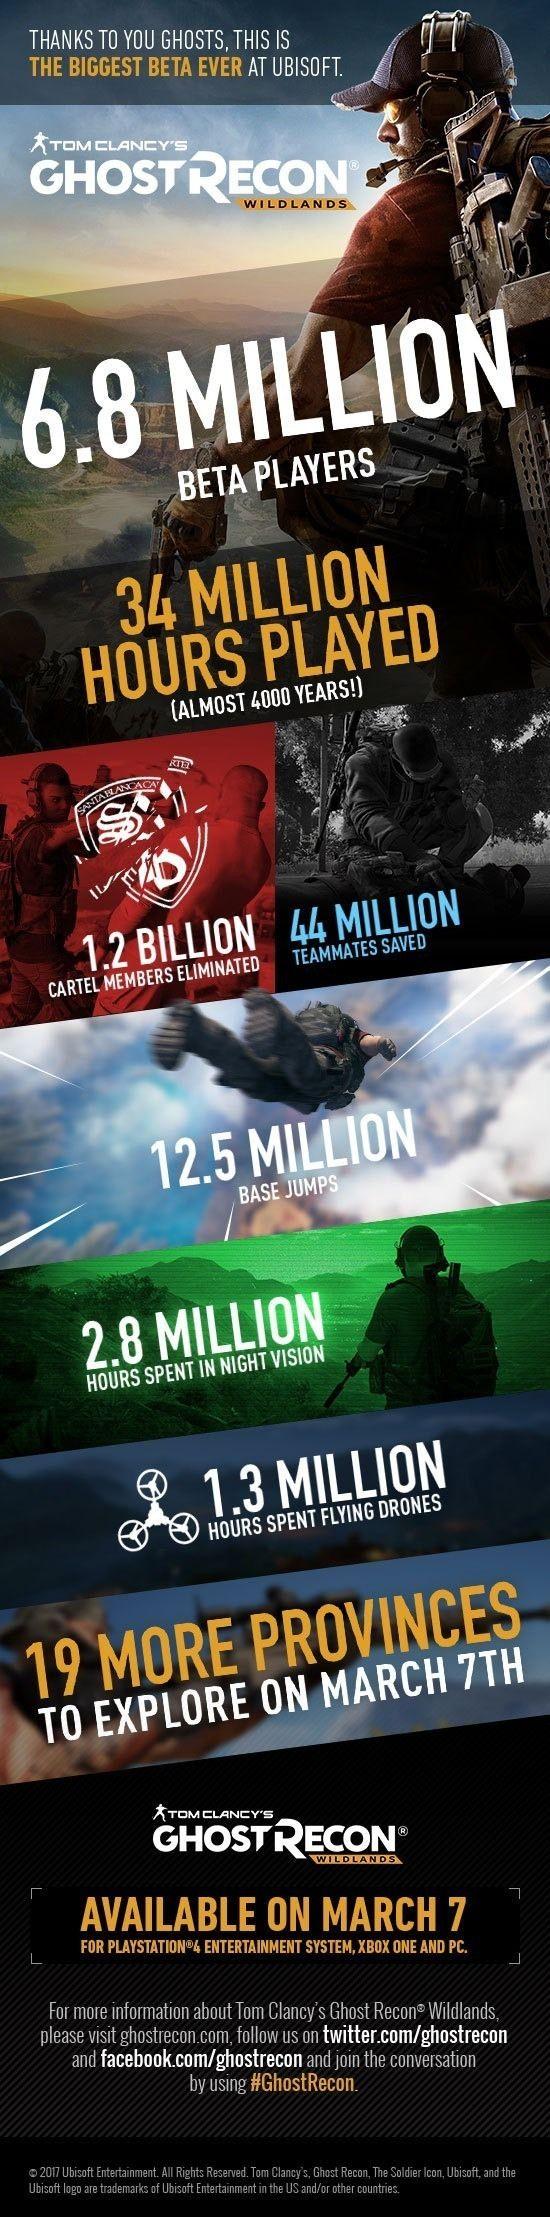 Ghost Recon Wildlands Betas Had Over 6 Million Players